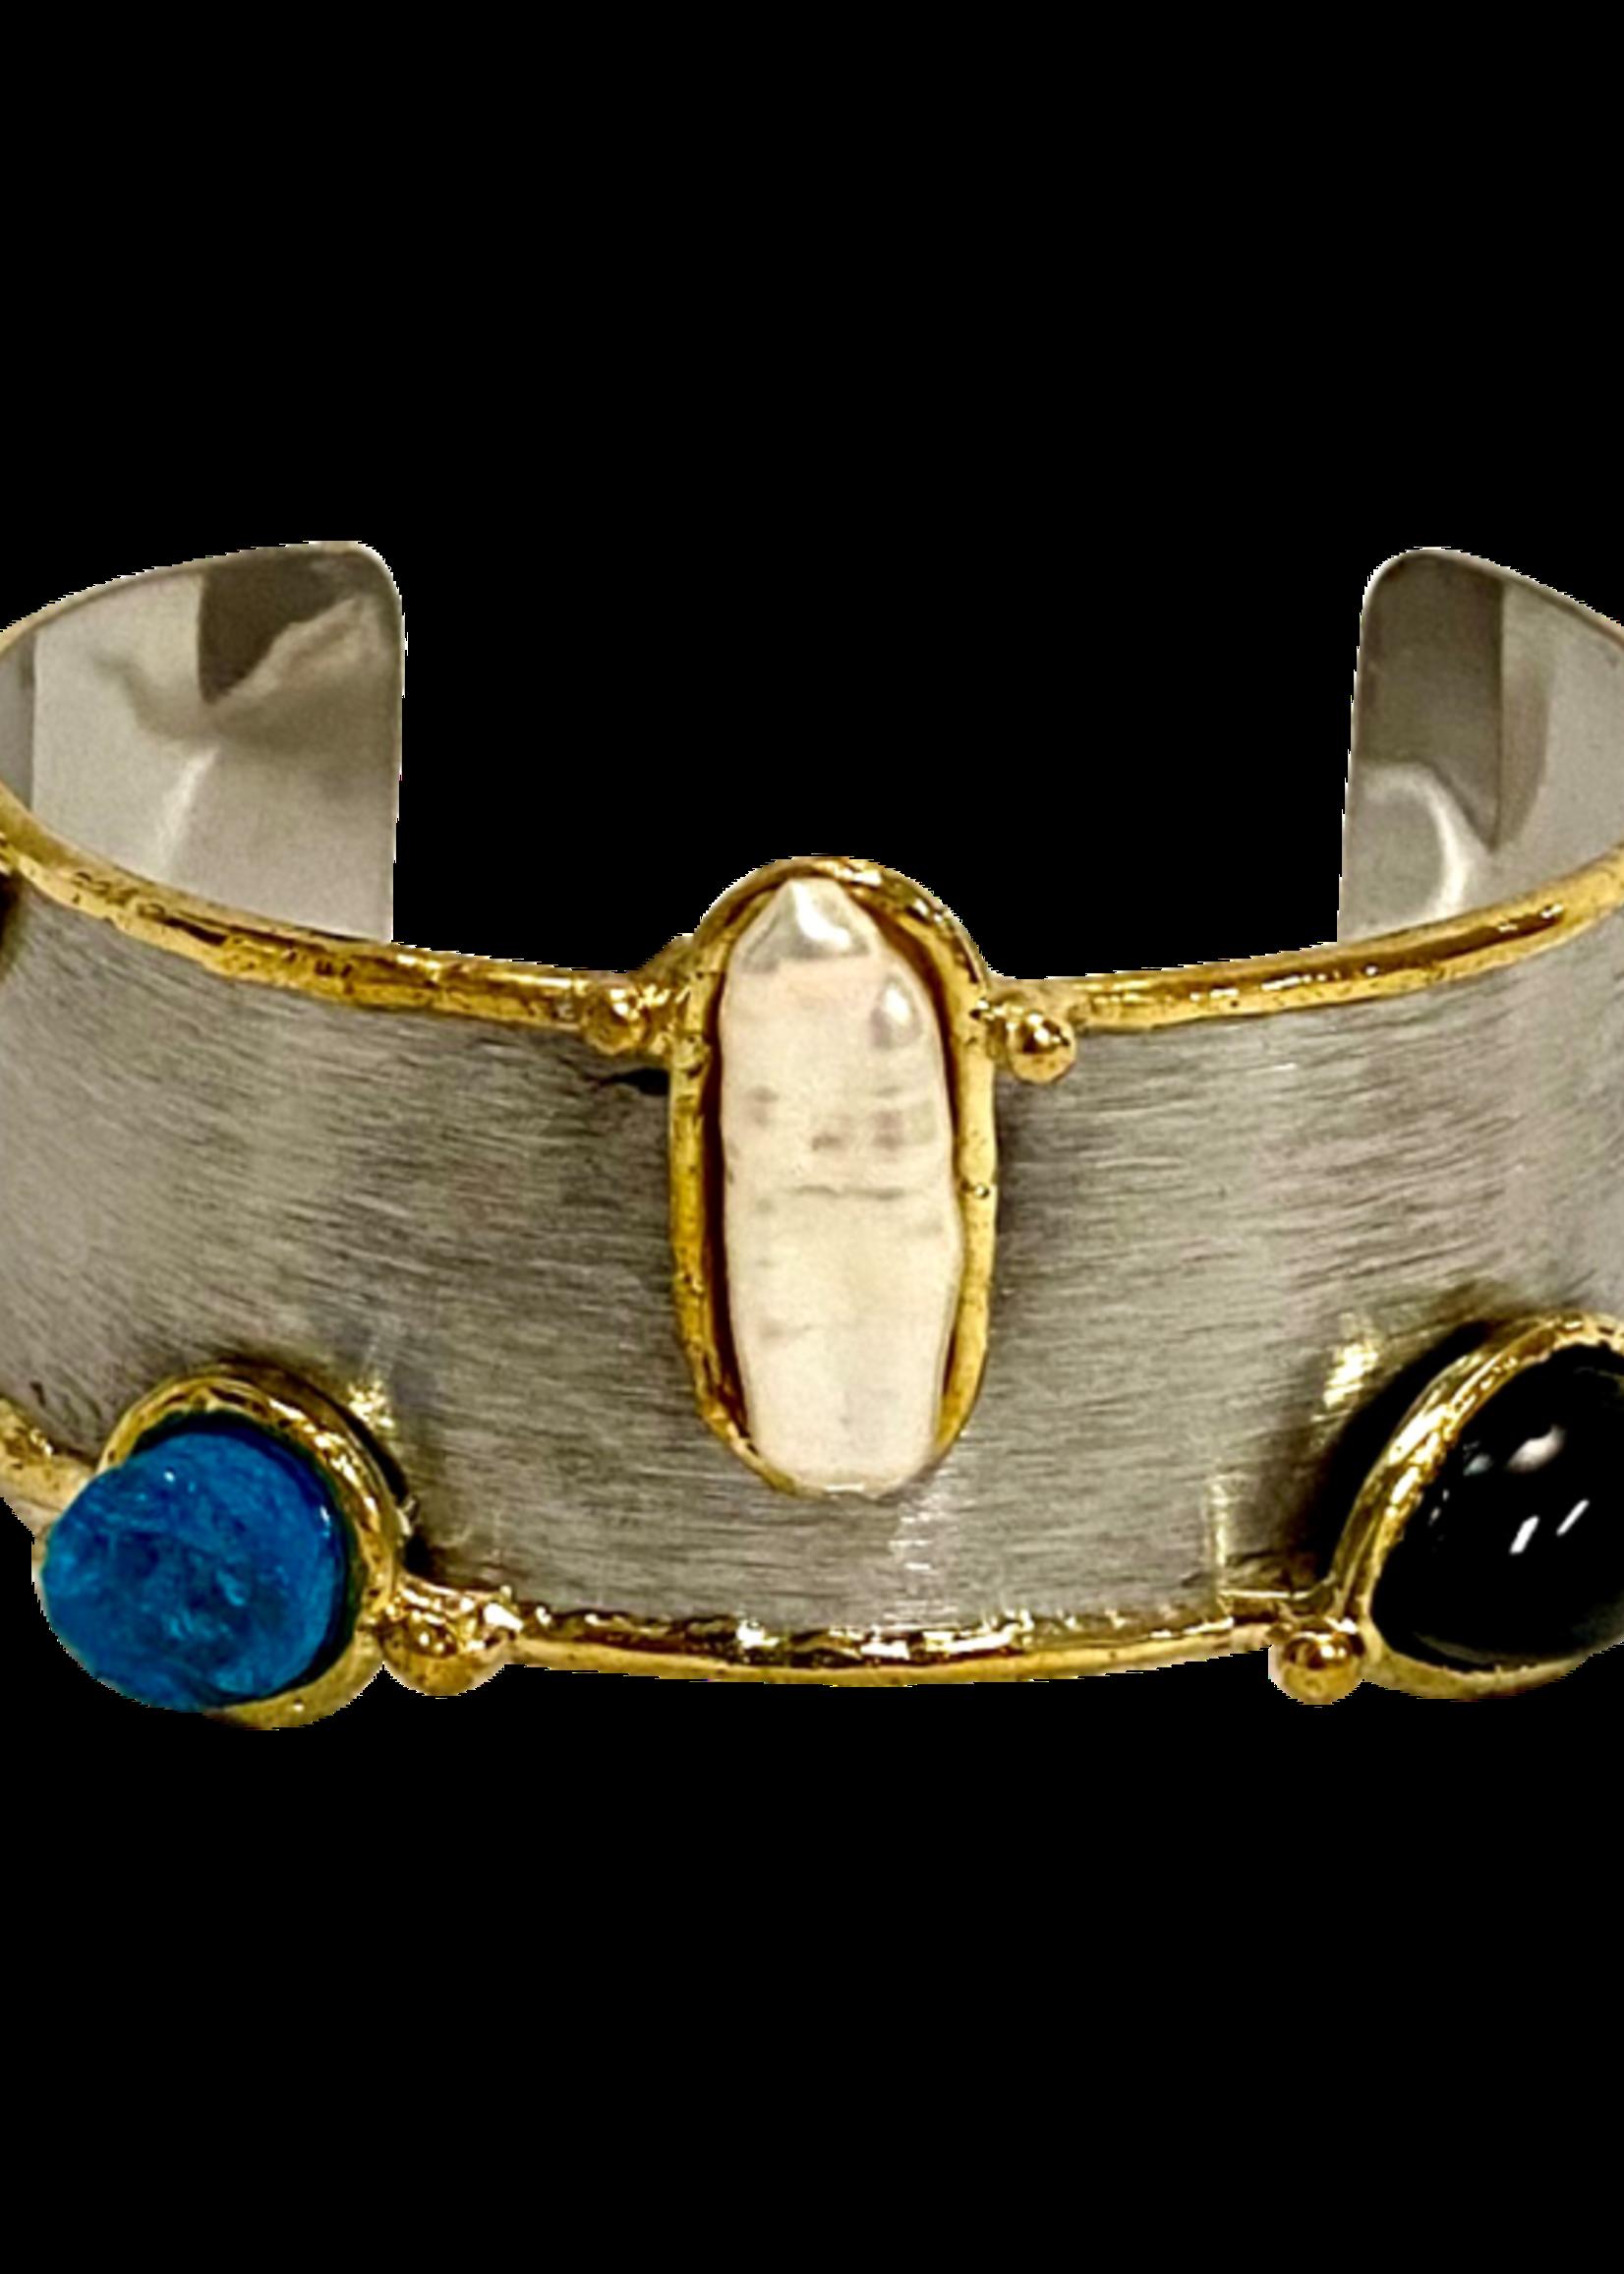 David Jeffery Brushed Stainless Cuff w/ Black Onyx, Blue Druzy, and Pearls